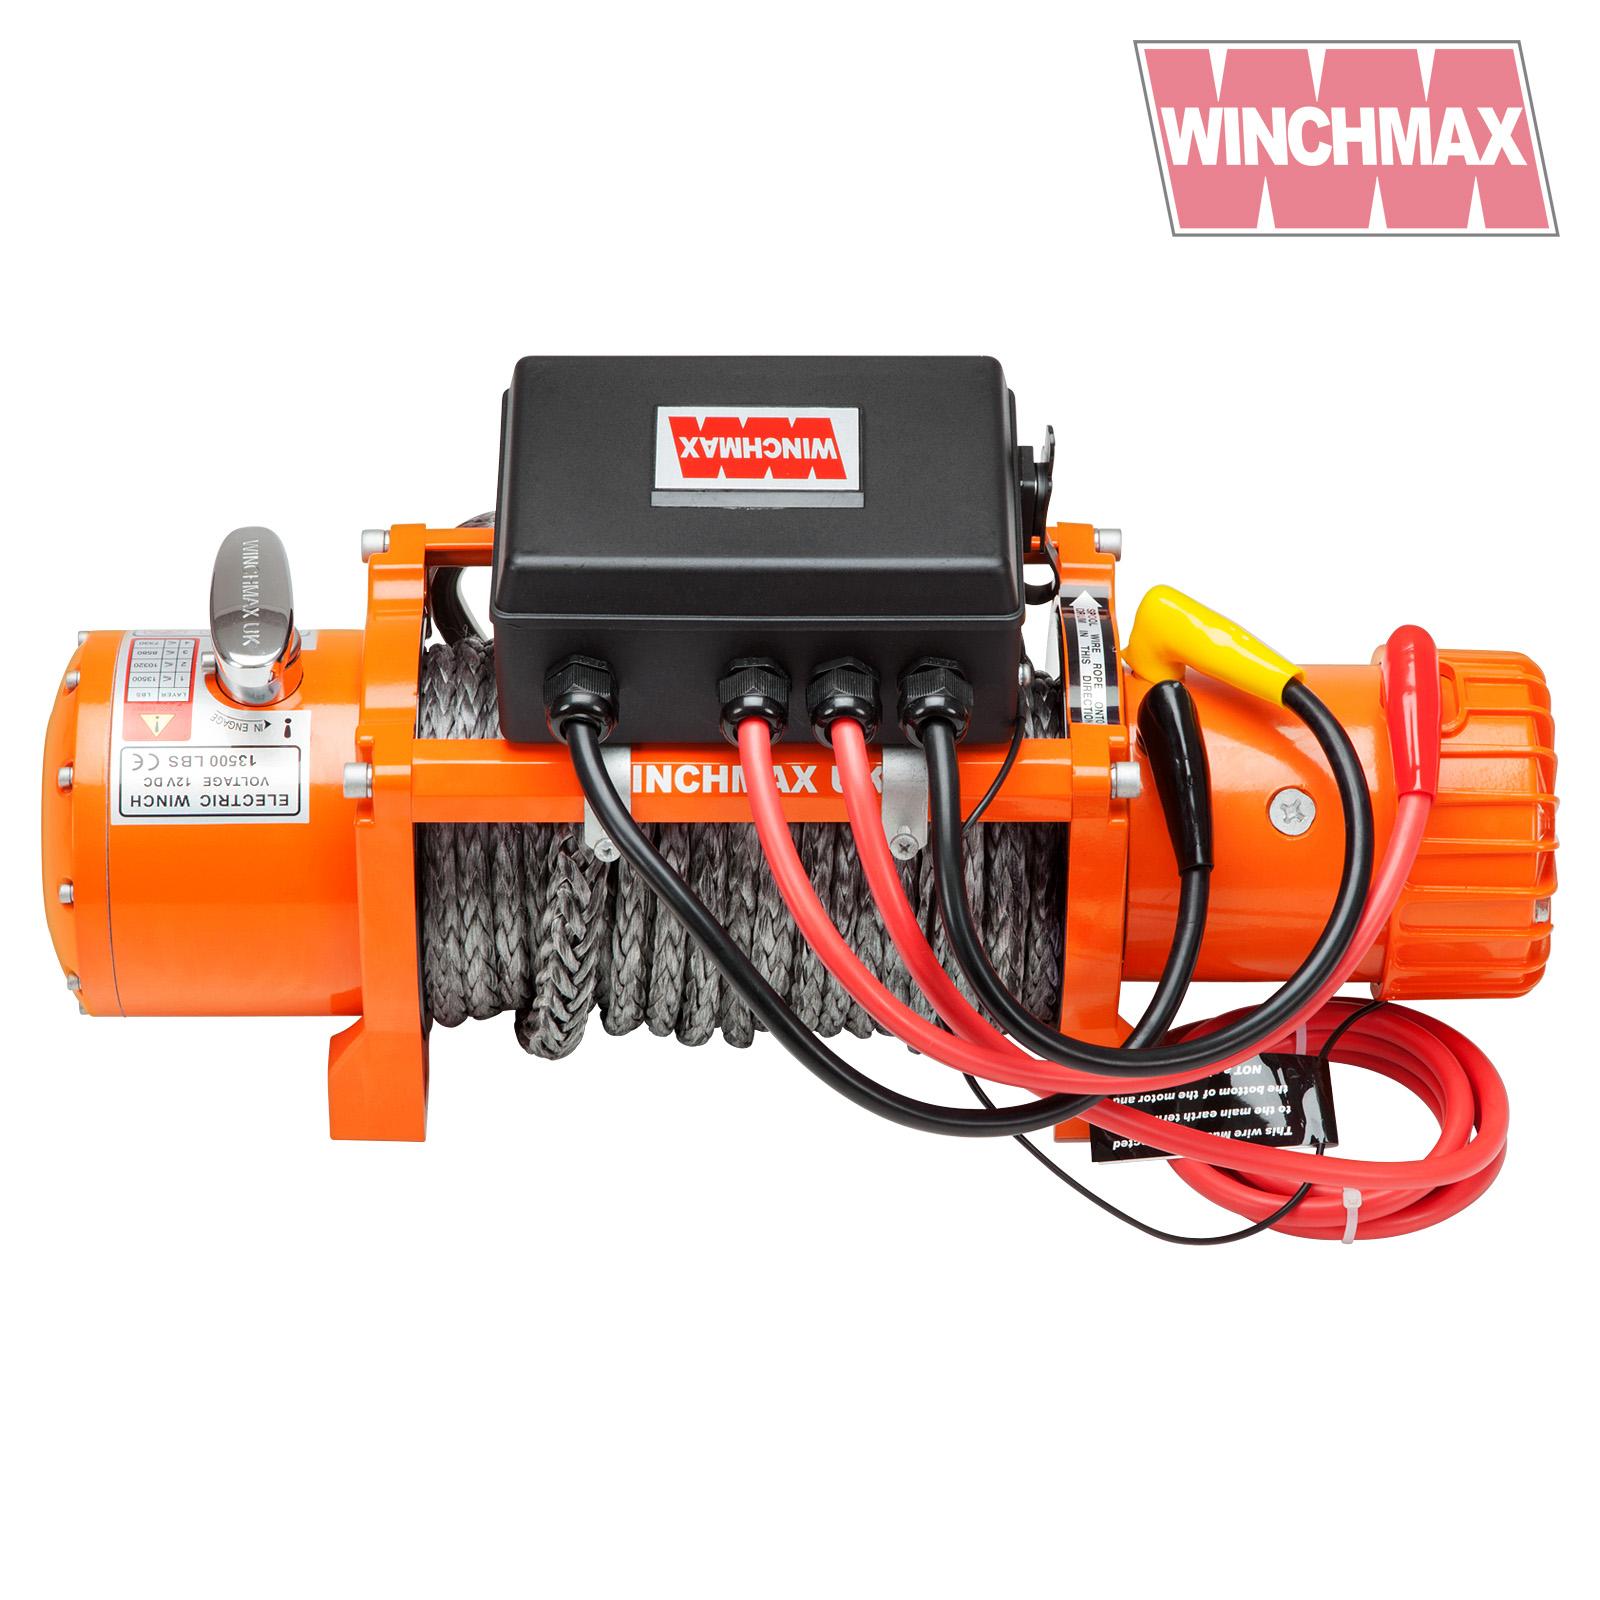 Wm1350012vsyn winchmax 505